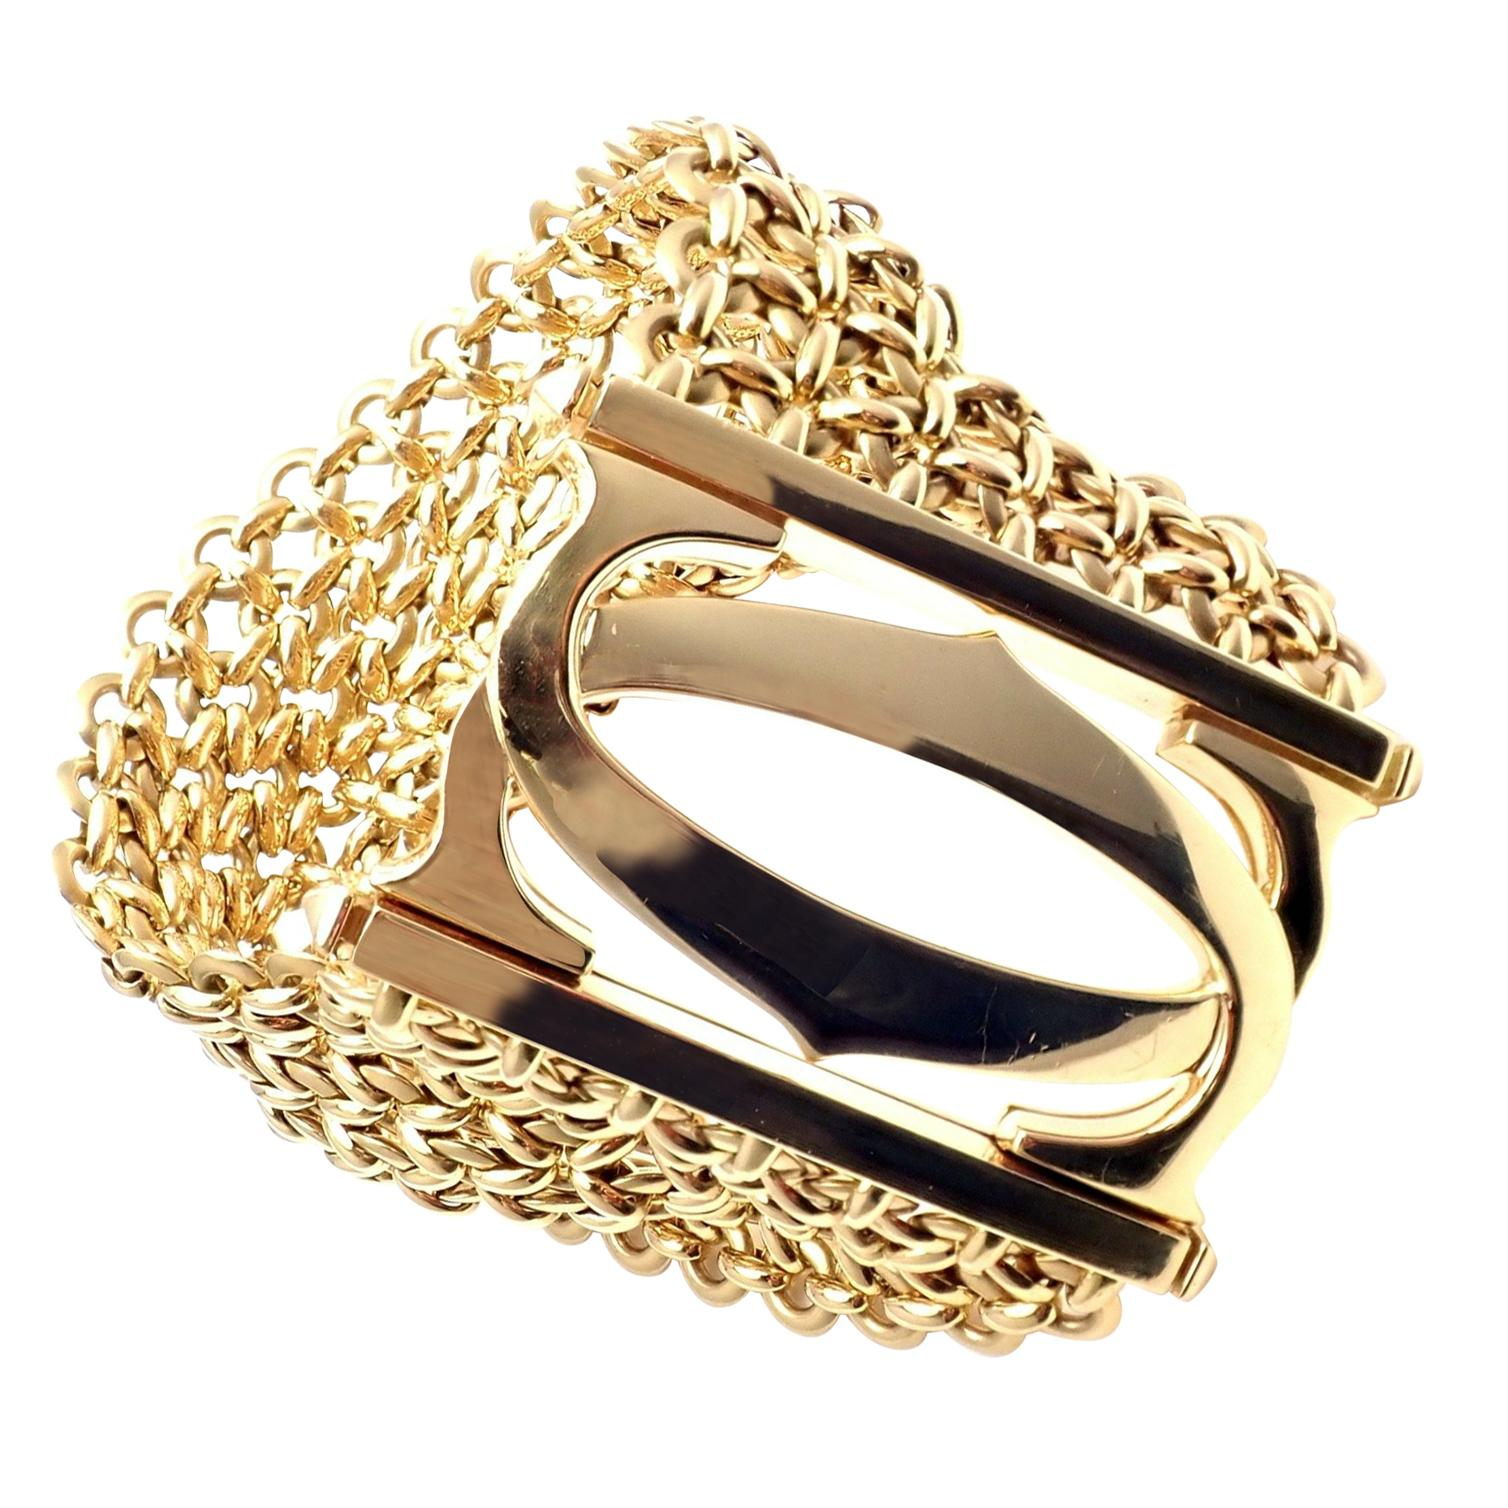 Cartier Penelope Double C Seven-Row Link Yellow Gold Bracelet